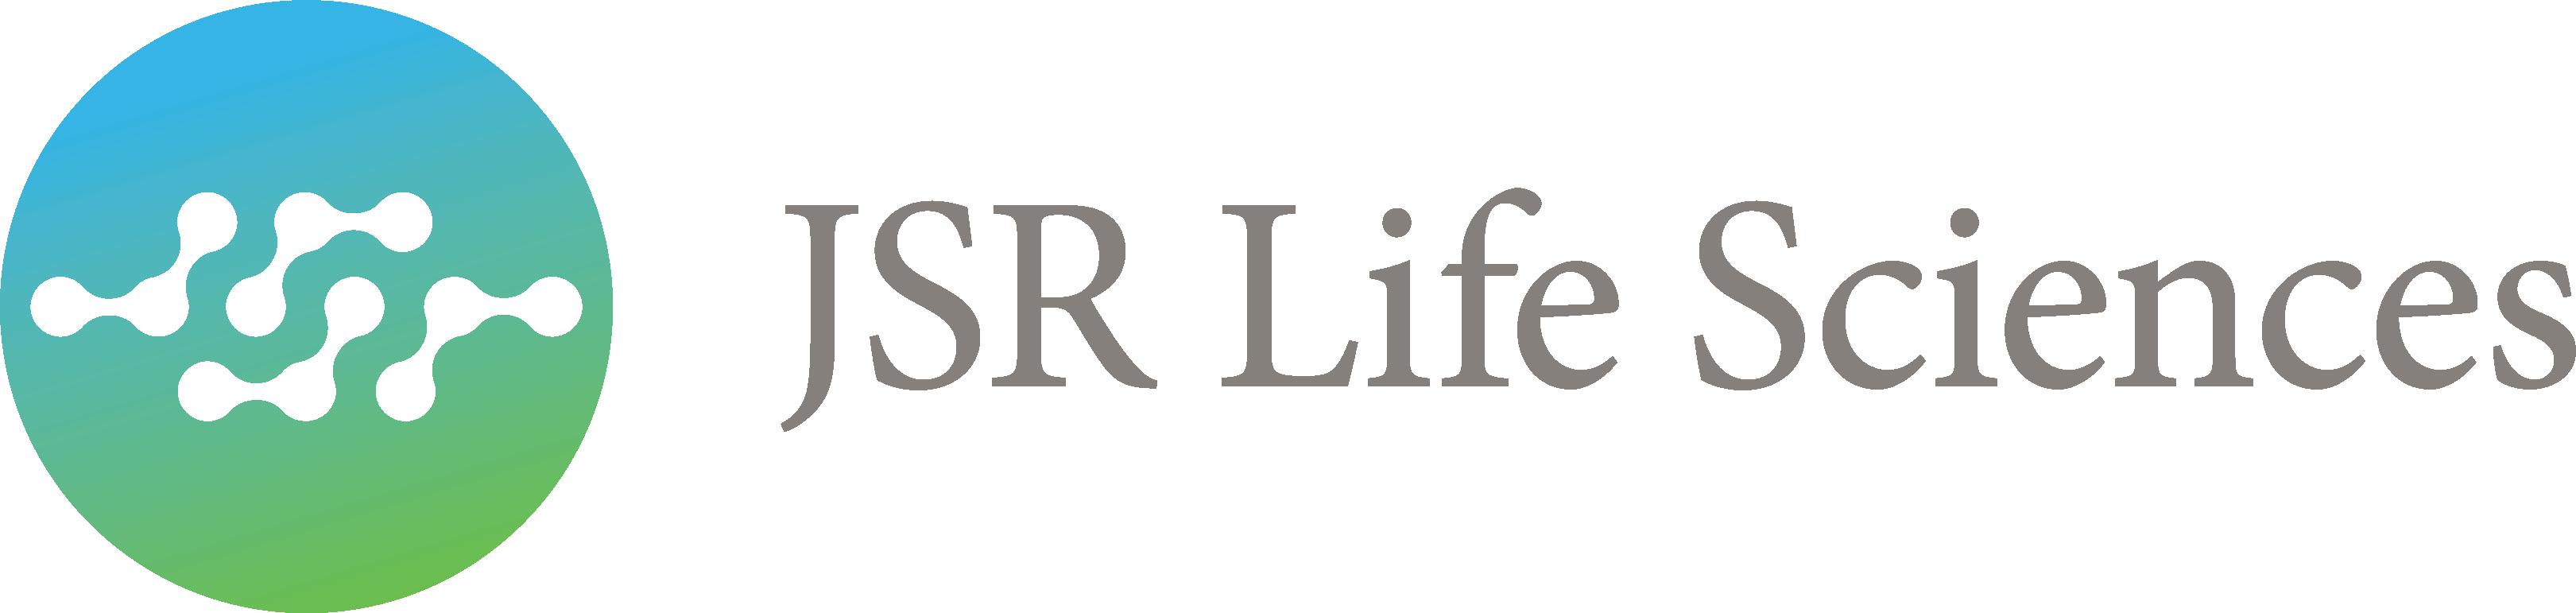 JSR LS Full Color Horizontal Logo 2019OCT62019